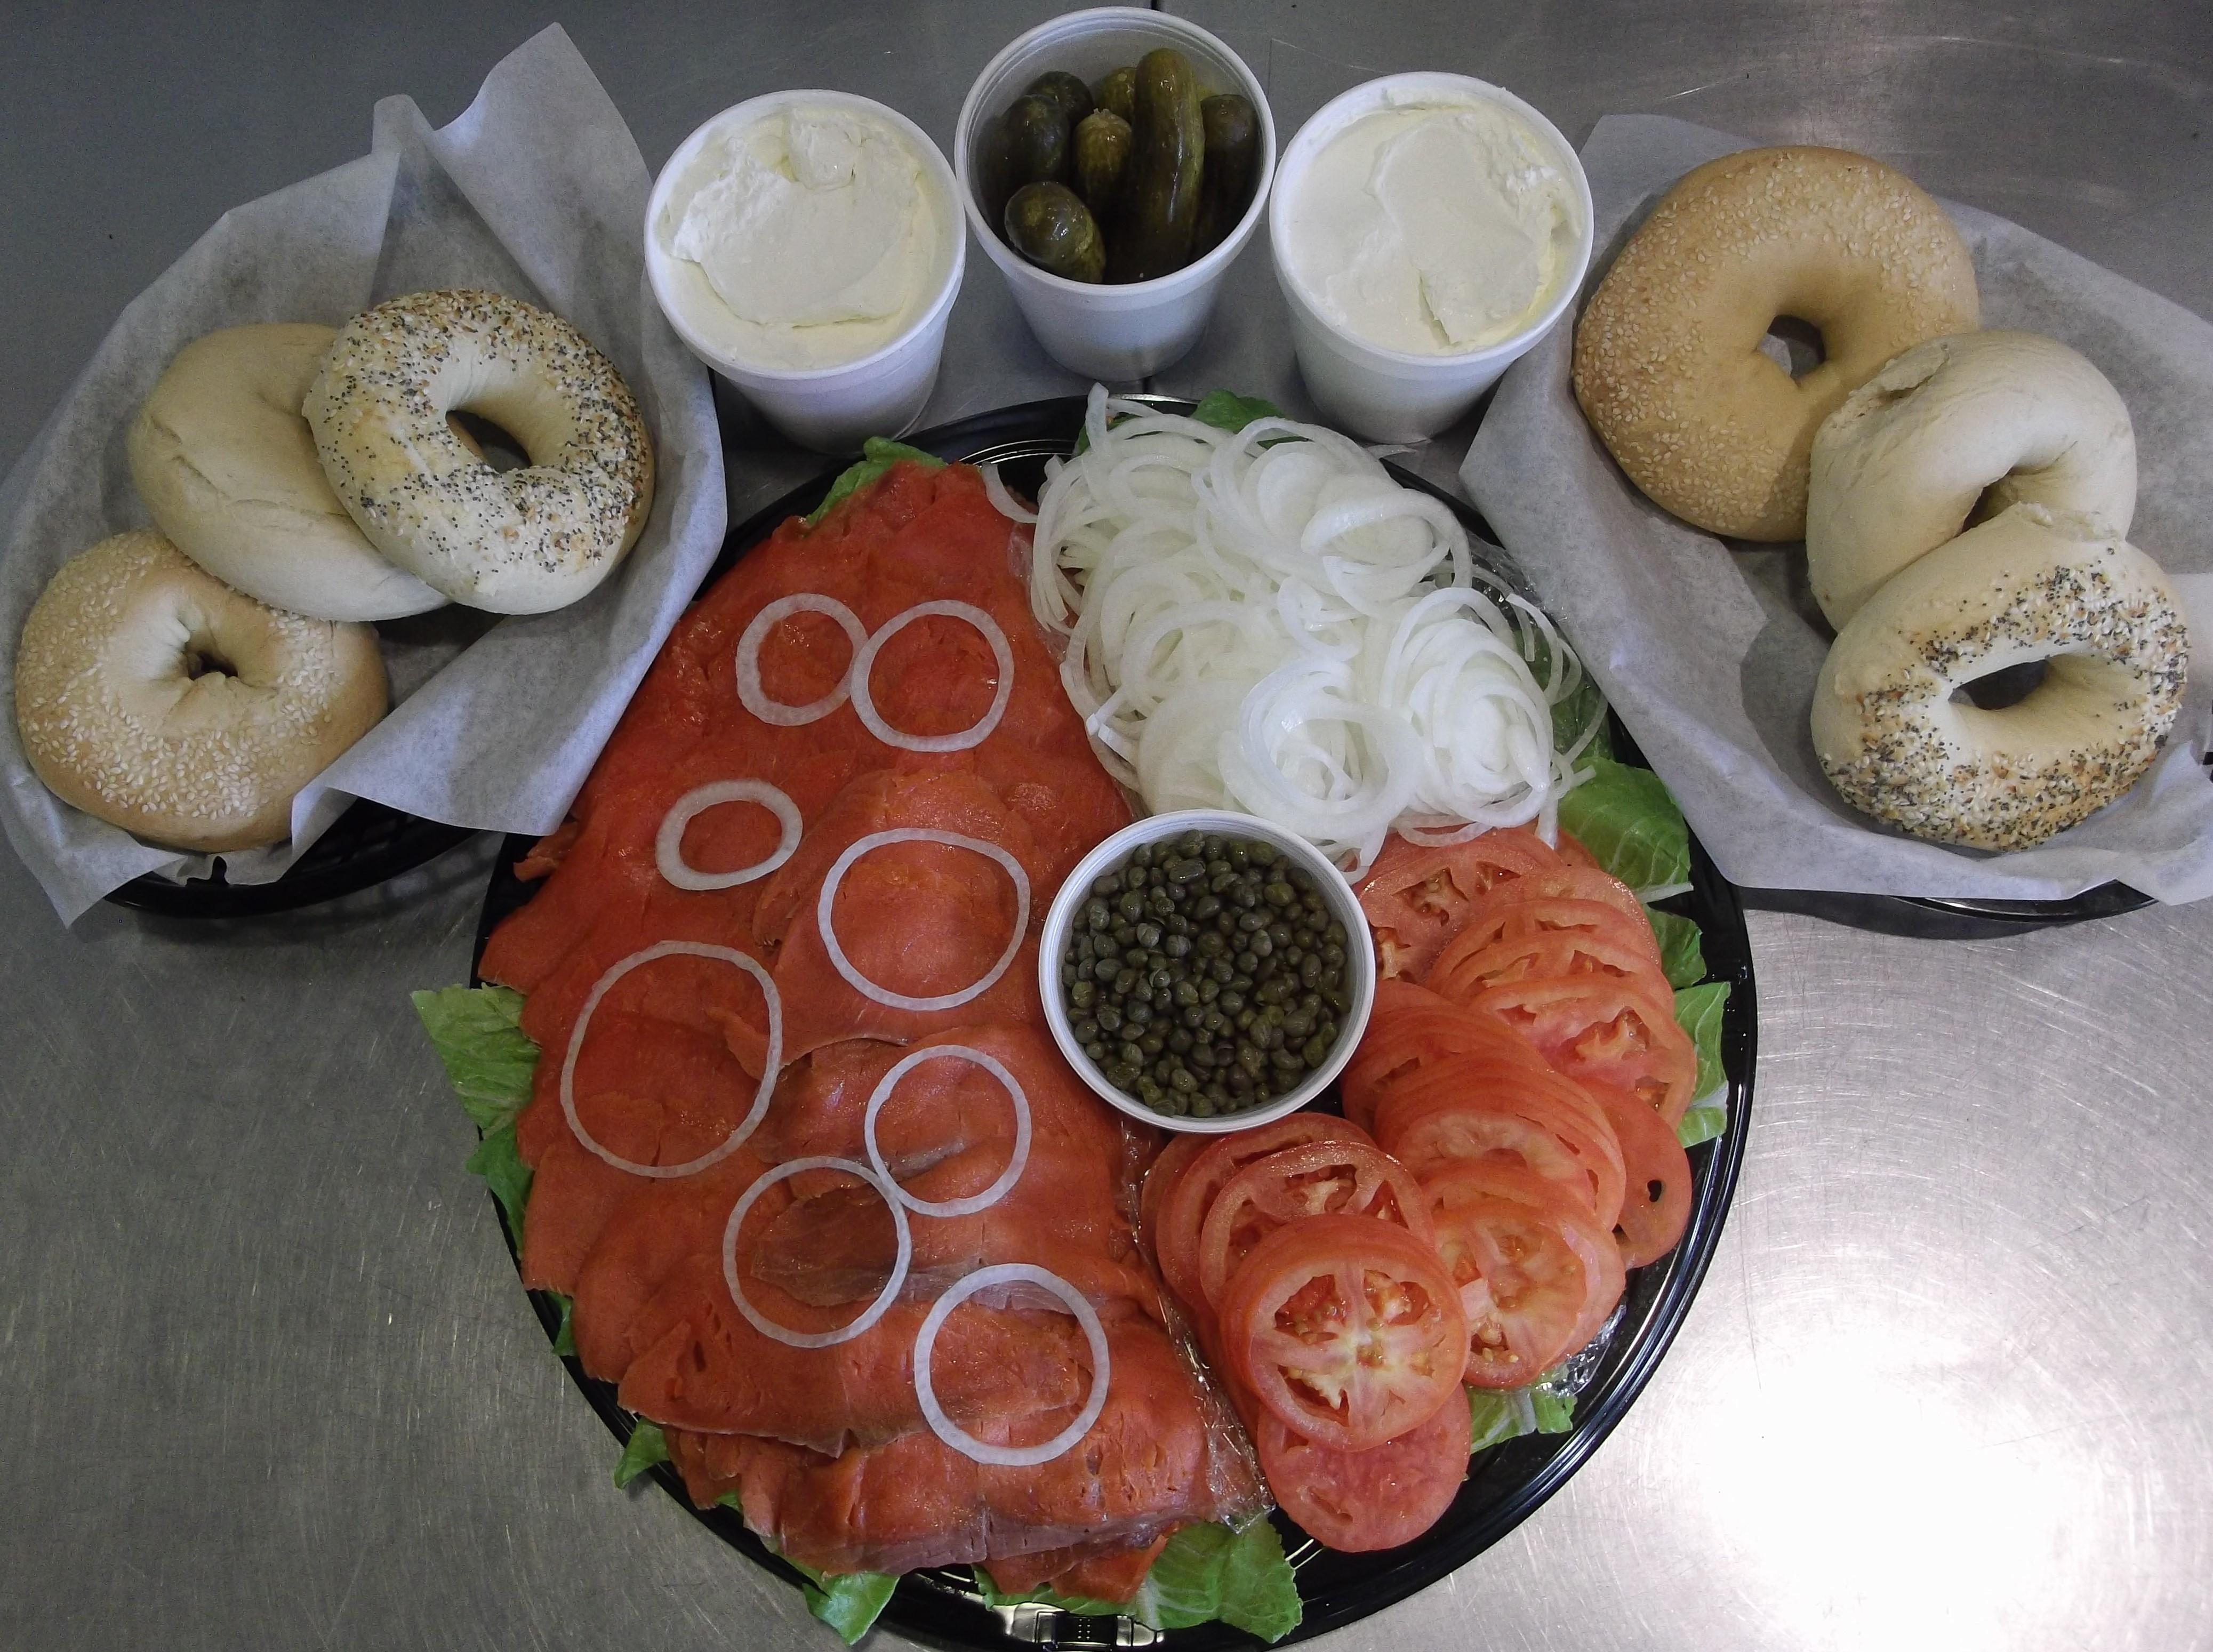 Salmon Lox Platter